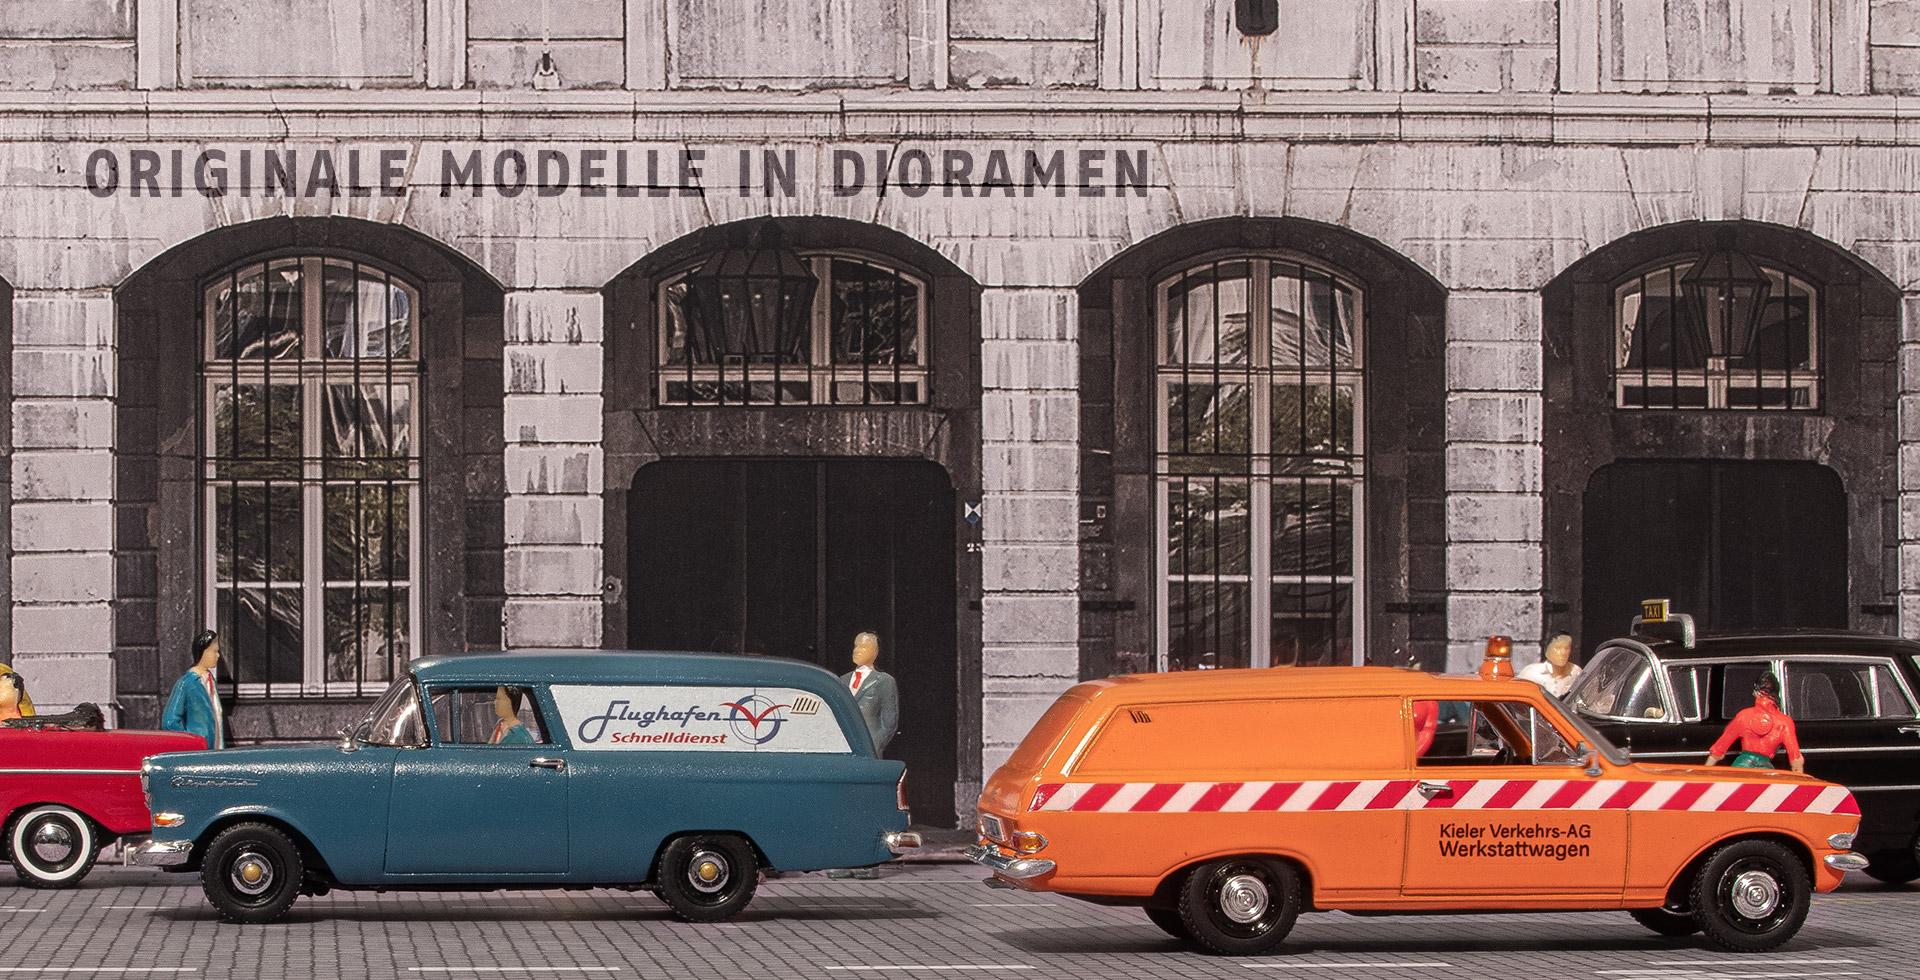 hahlmodelle.de | Modelle in Dioramen